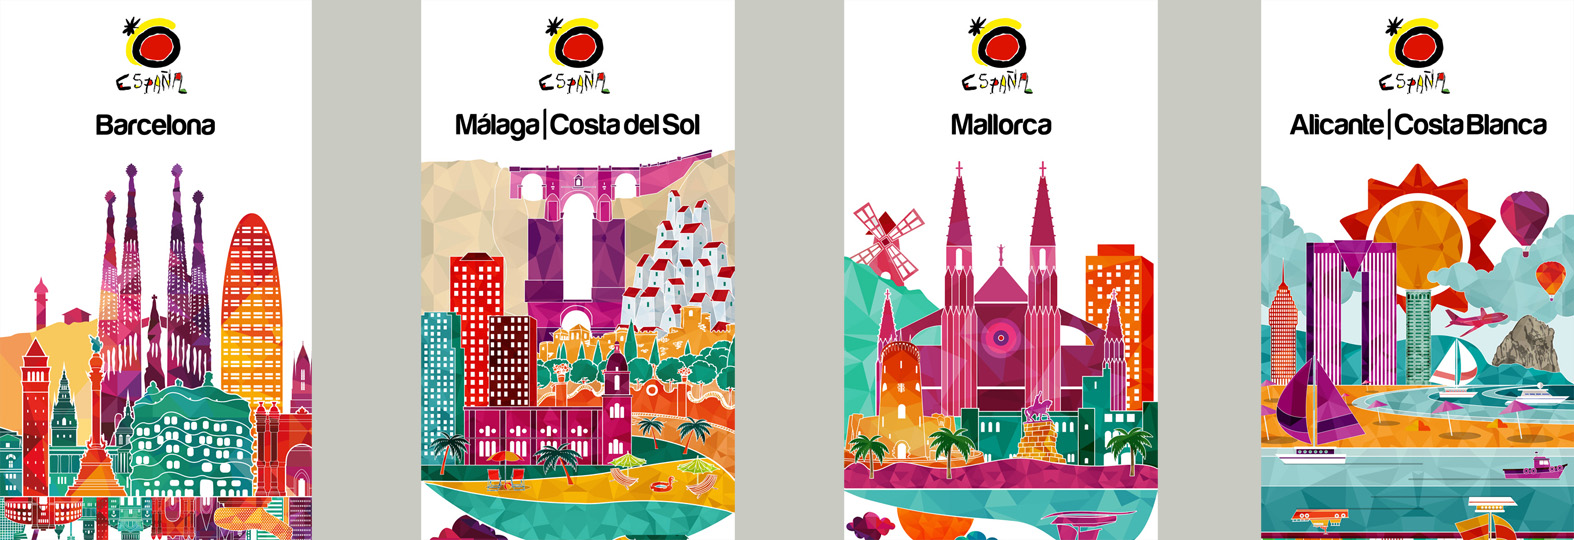 117 oficina de turismo barcelona visitar la pineda de can camins en el delta del llobregat - Oficina de turismo de barcelona ...